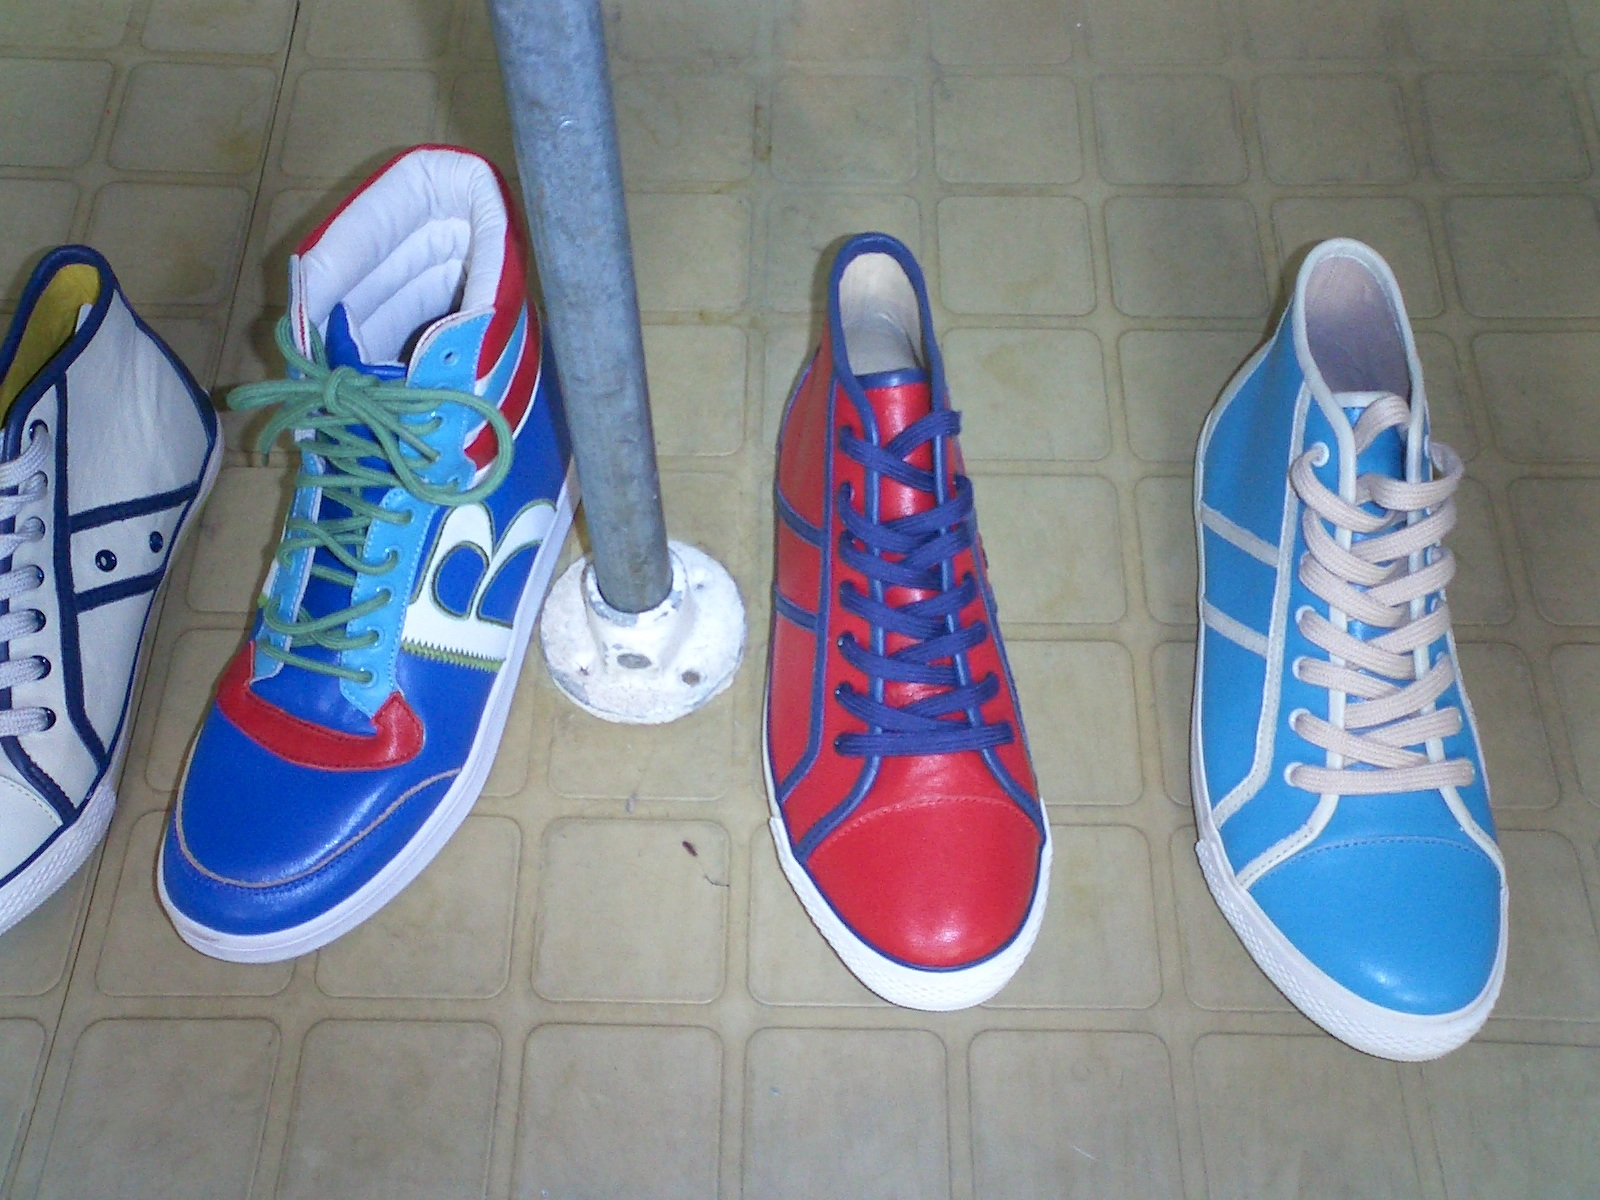 http://4.bp.blogspot.com/_dnv-mqmqpz4/R1Hf50gRrzI/AAAAAAAAAN8/ZGuov5Y_KnA/s1600-R/biba%2Btrainers.jpg